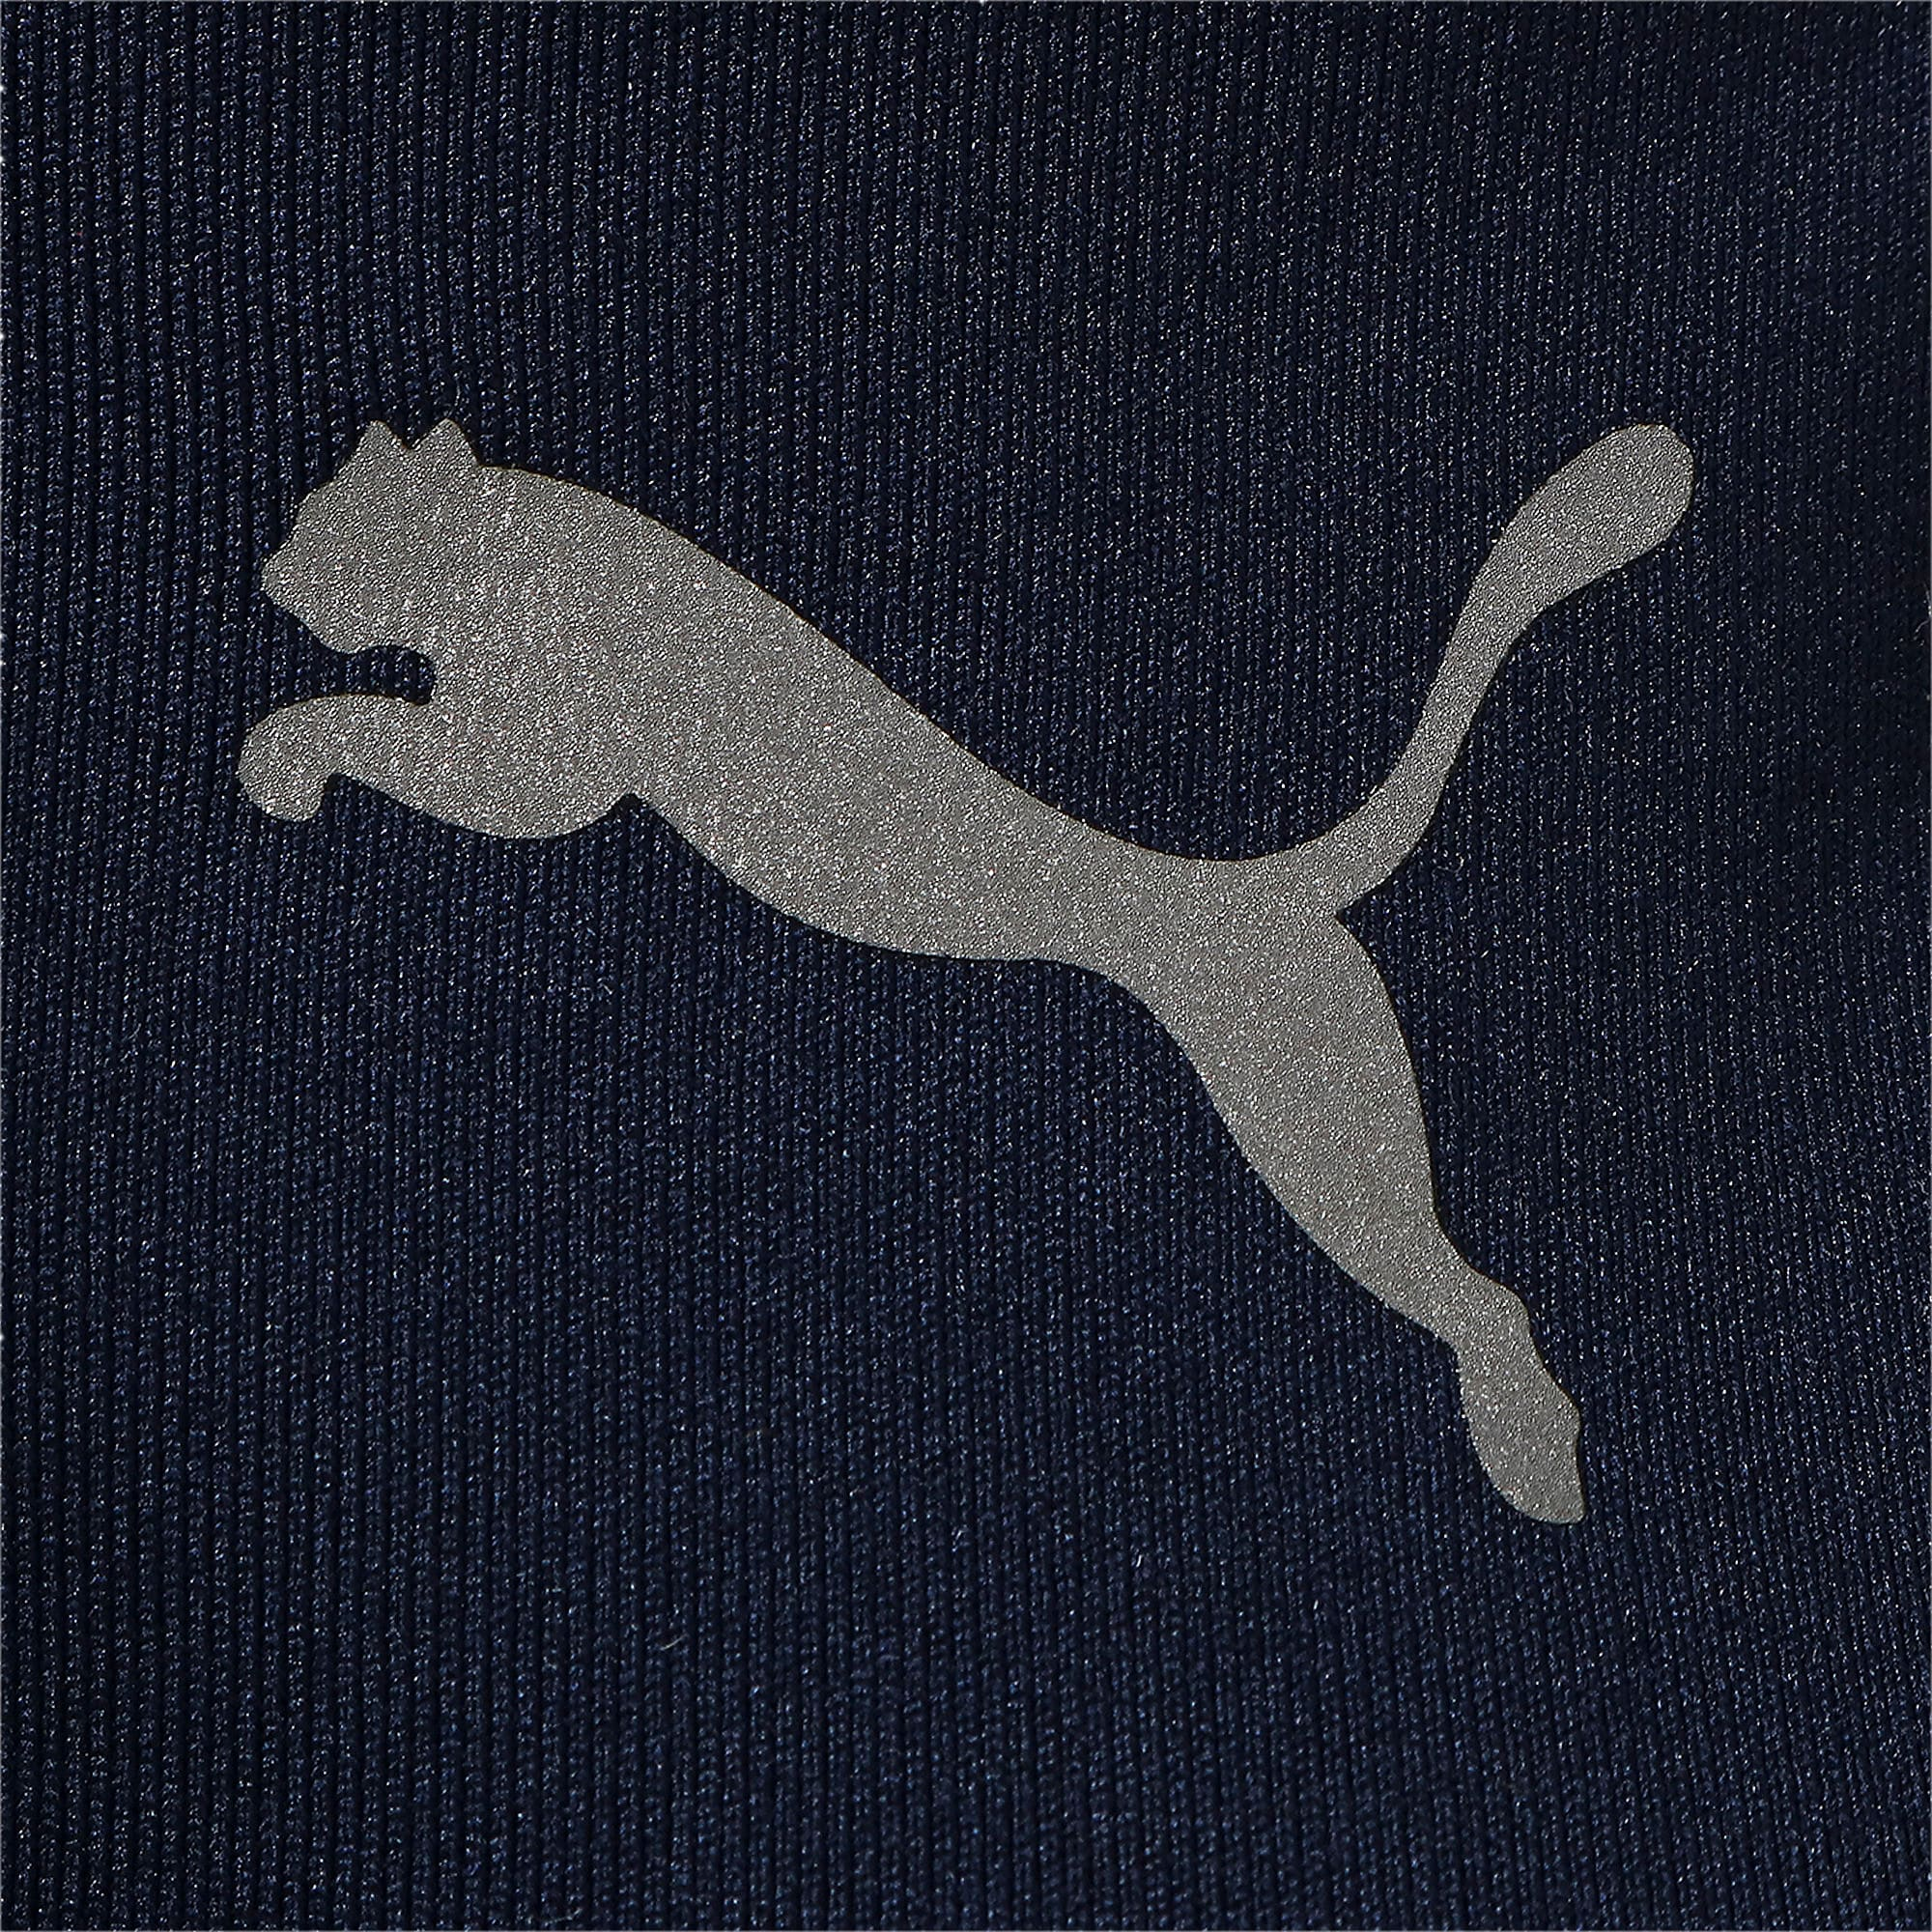 Thumbnail 4 of テック ライト LSモックネック ウィメンズ トレーニング Tシャツ 長袖, Peacoat, medium-JPN